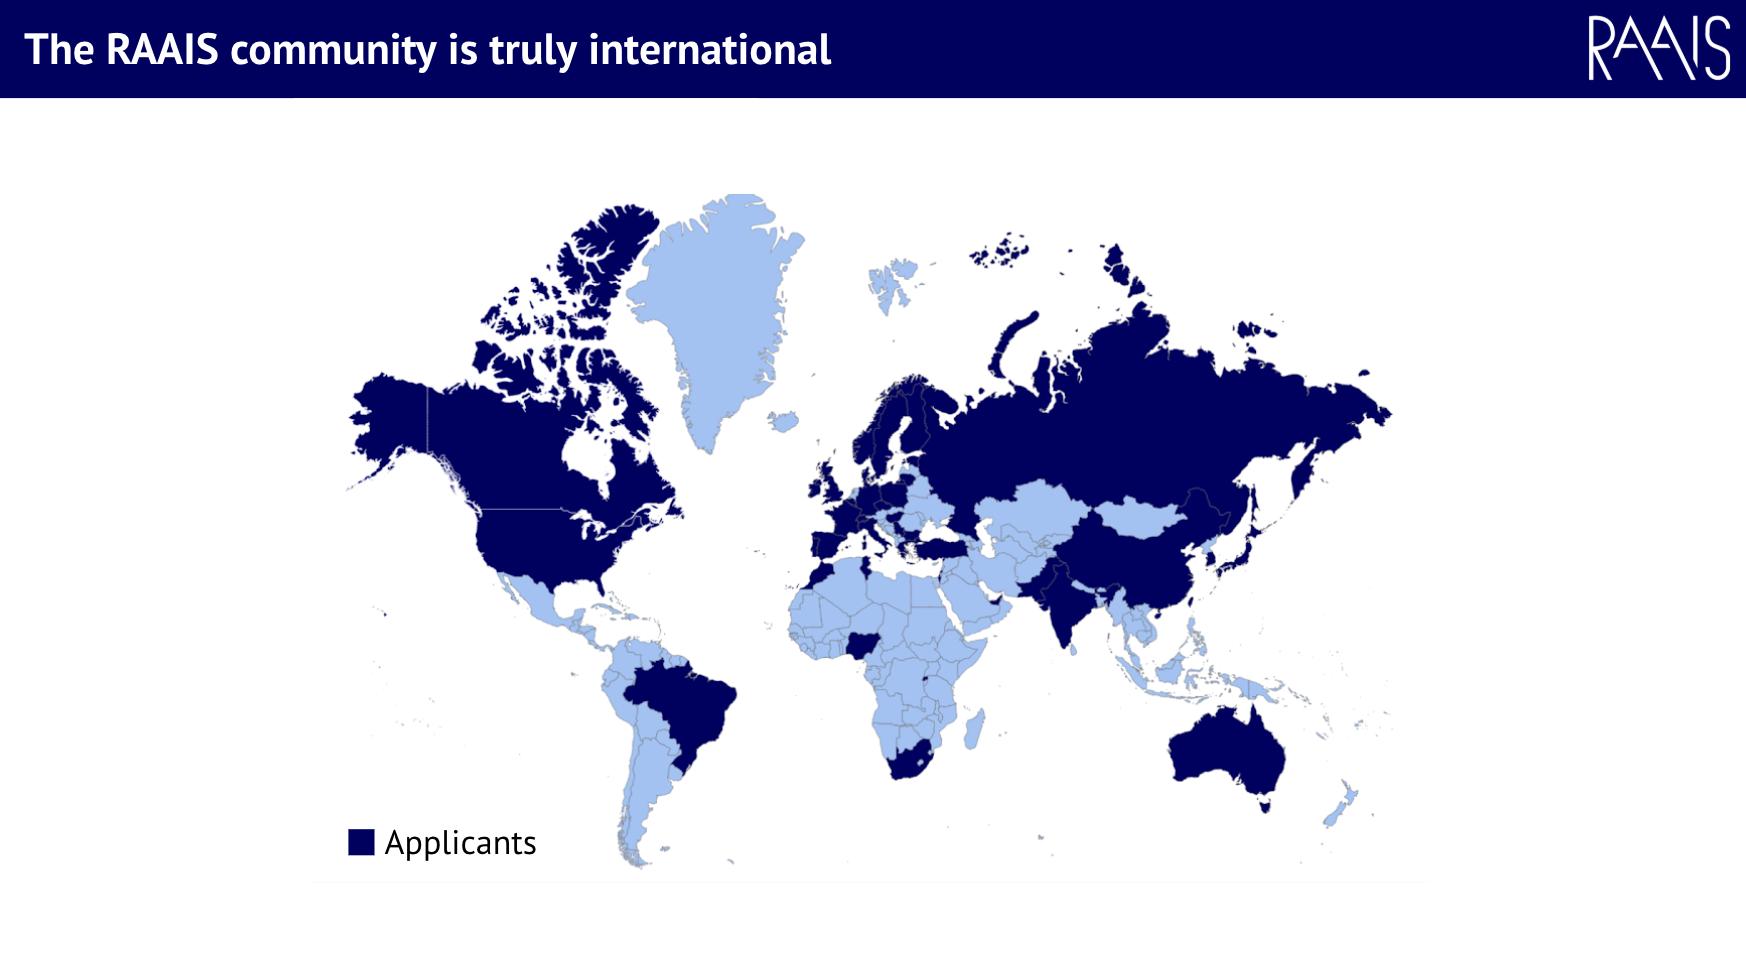 The RAAIS community is international